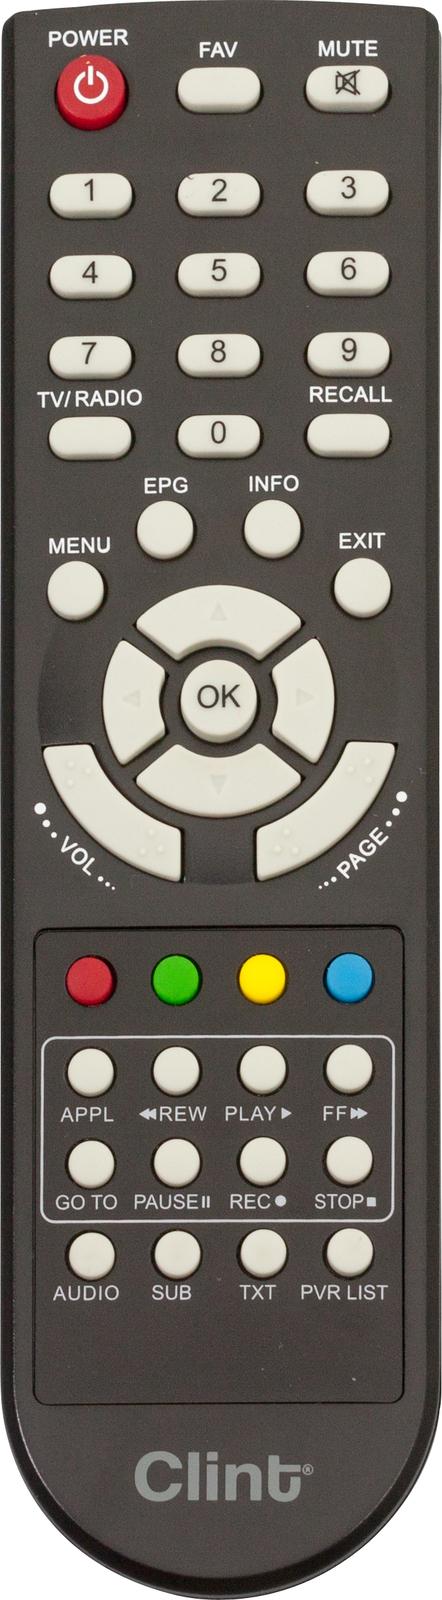 Clint Remote Control